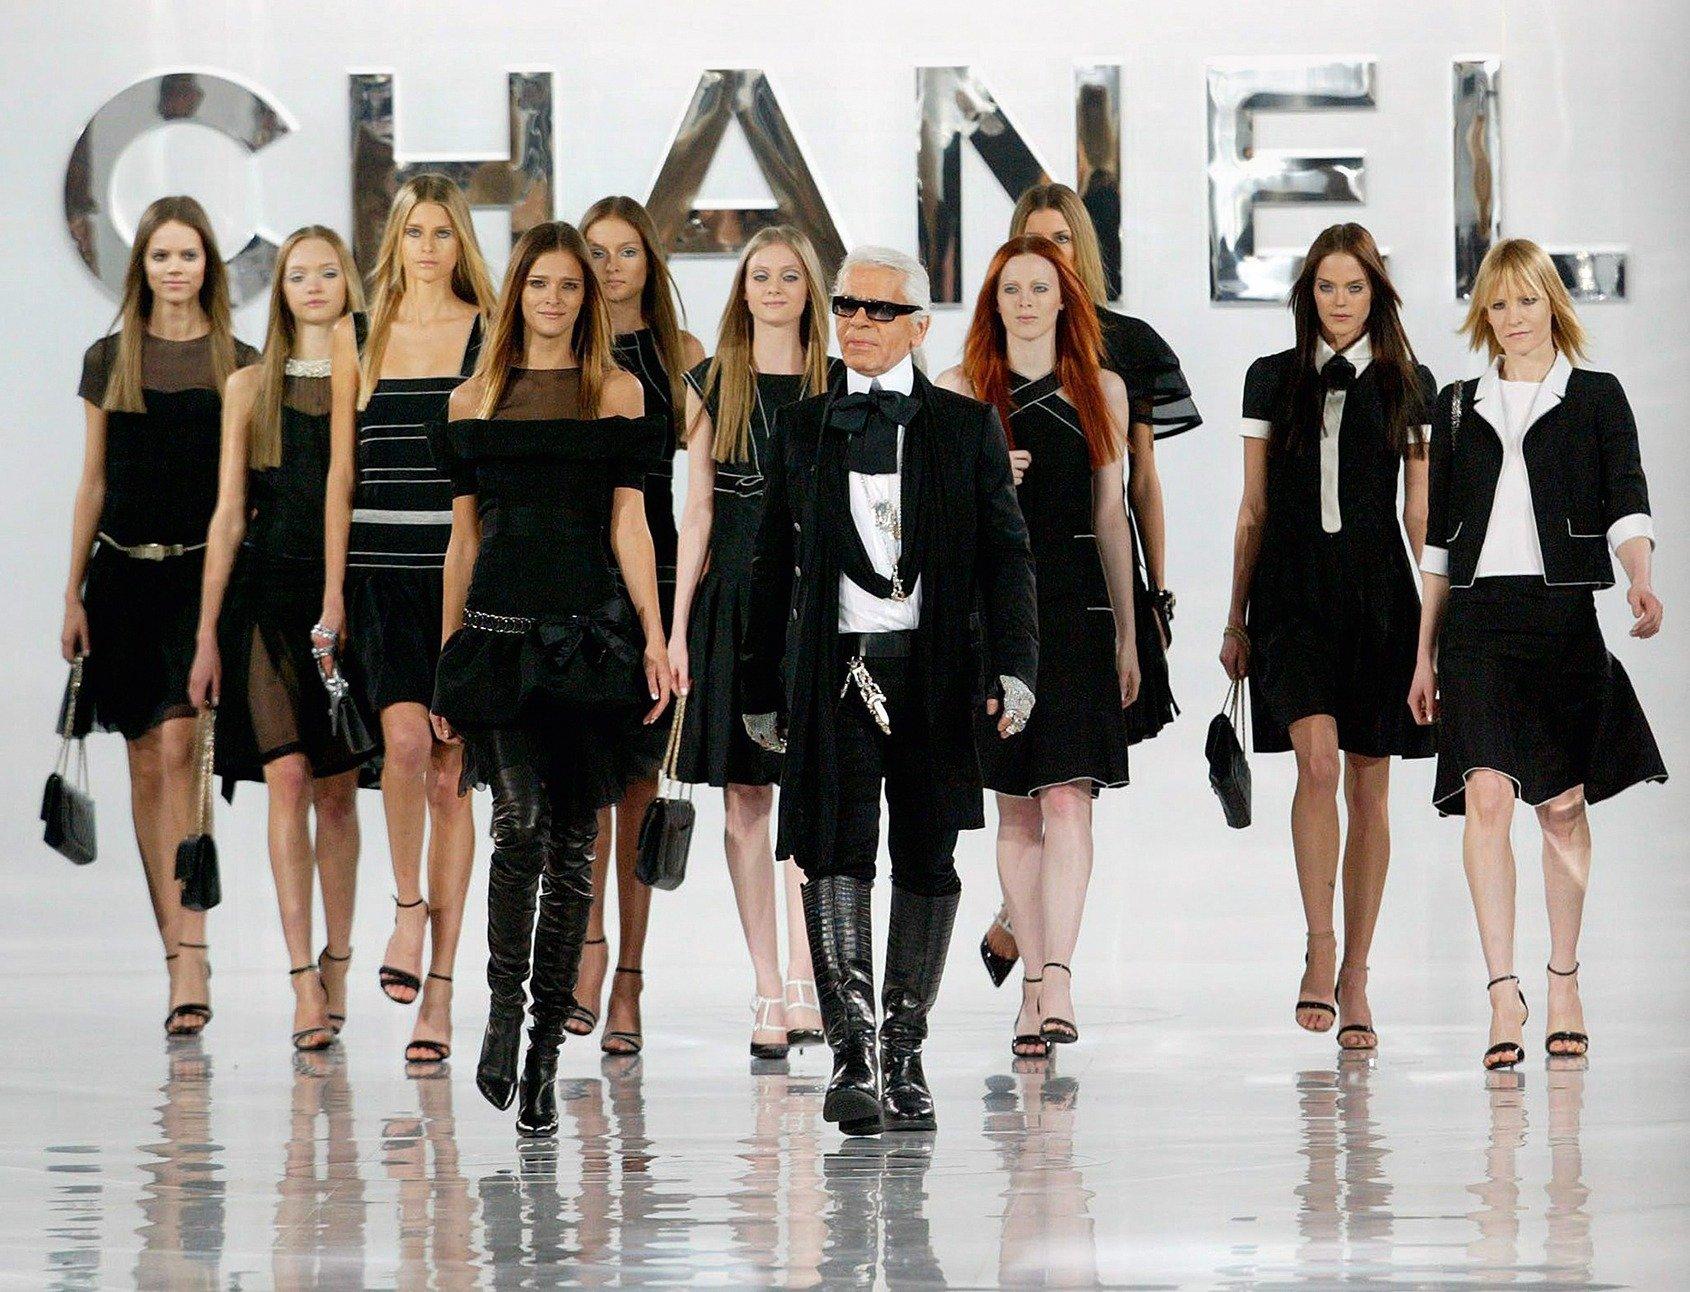 294 Lagerfeld 1 - Karl Lagerfeld- the designer who reinvented luxury fashion!